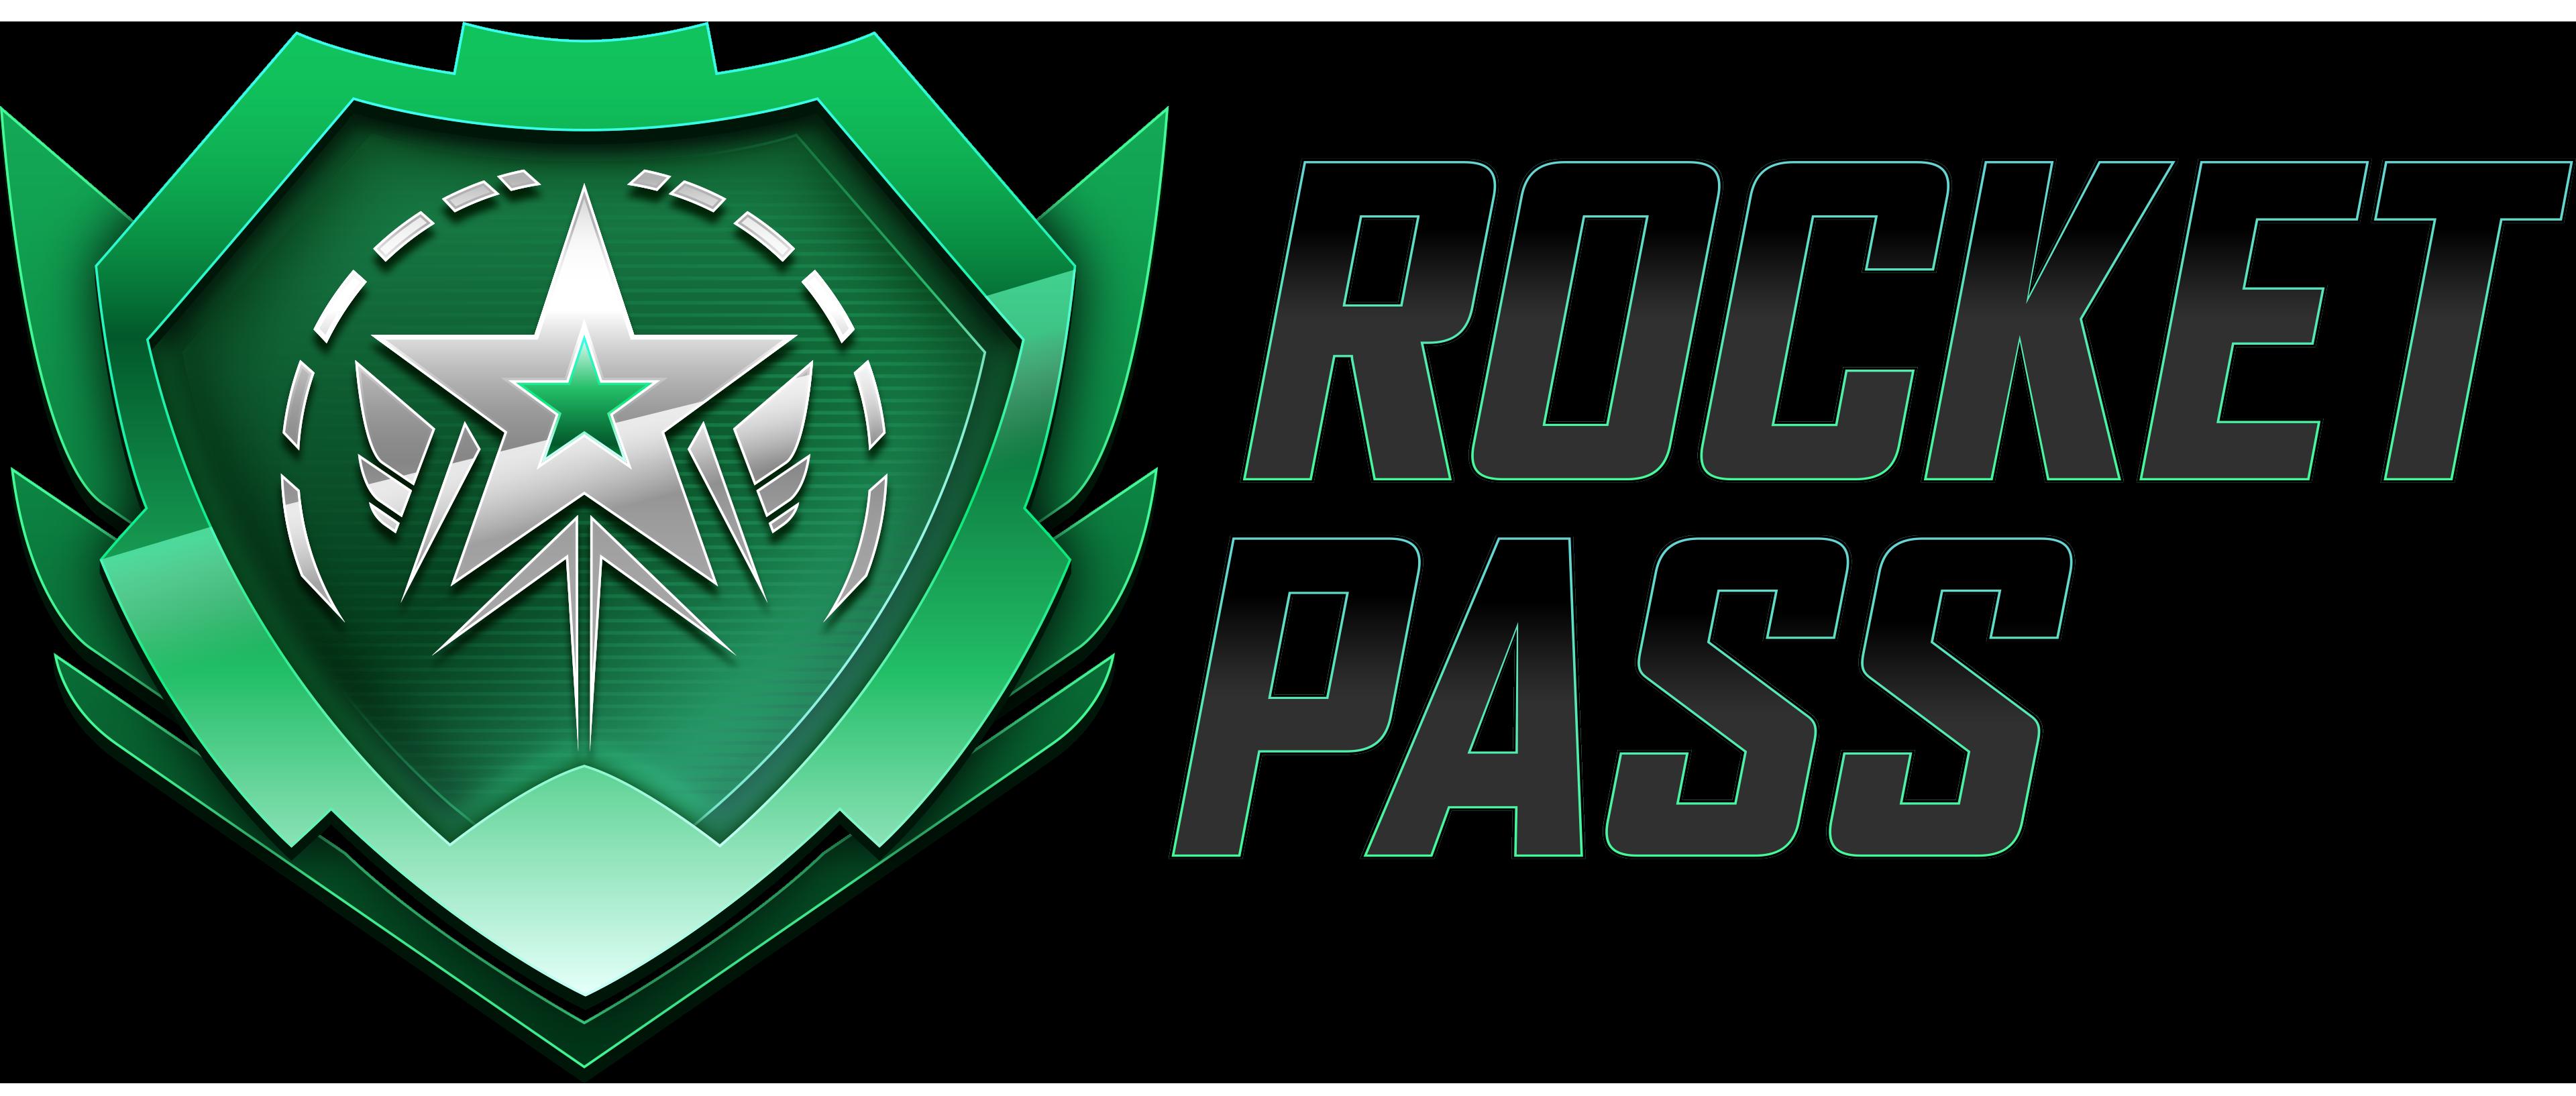 Most Epic Win Rocket League Rocket Pass